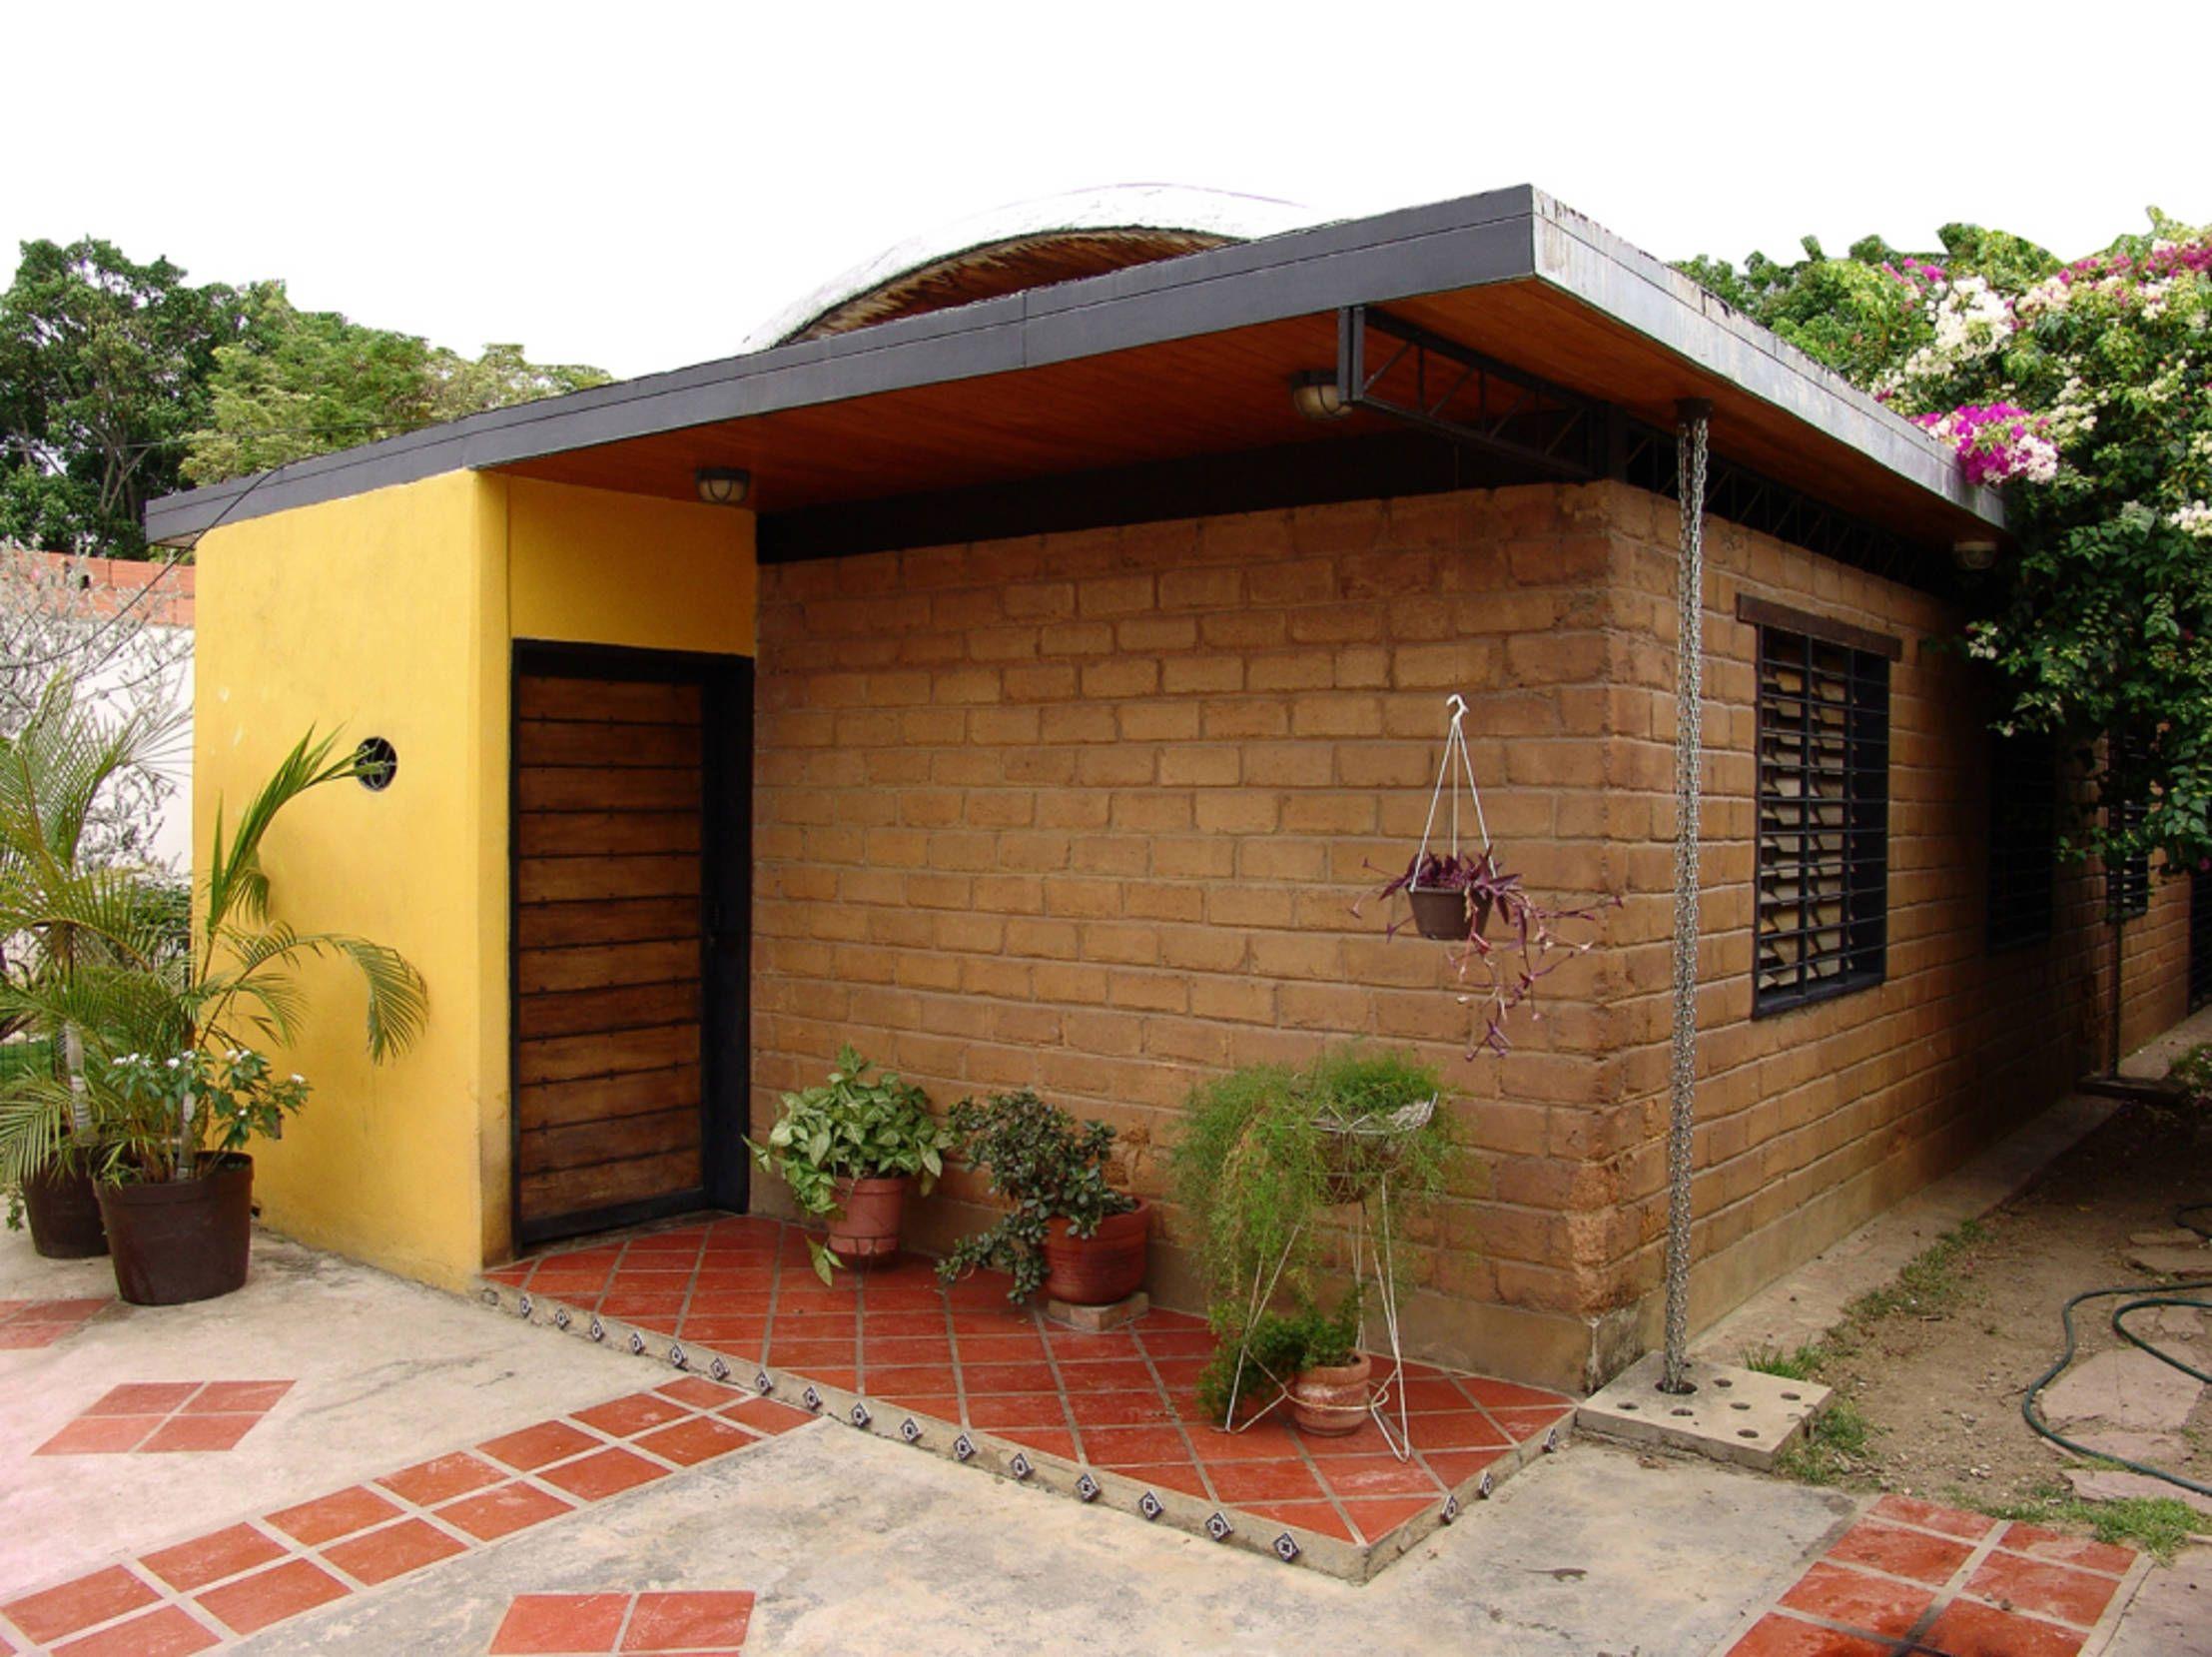 Casitas Rusticas De Campo Free Fabulous With Casas De Campo - Casitas-rusticas-de-campo